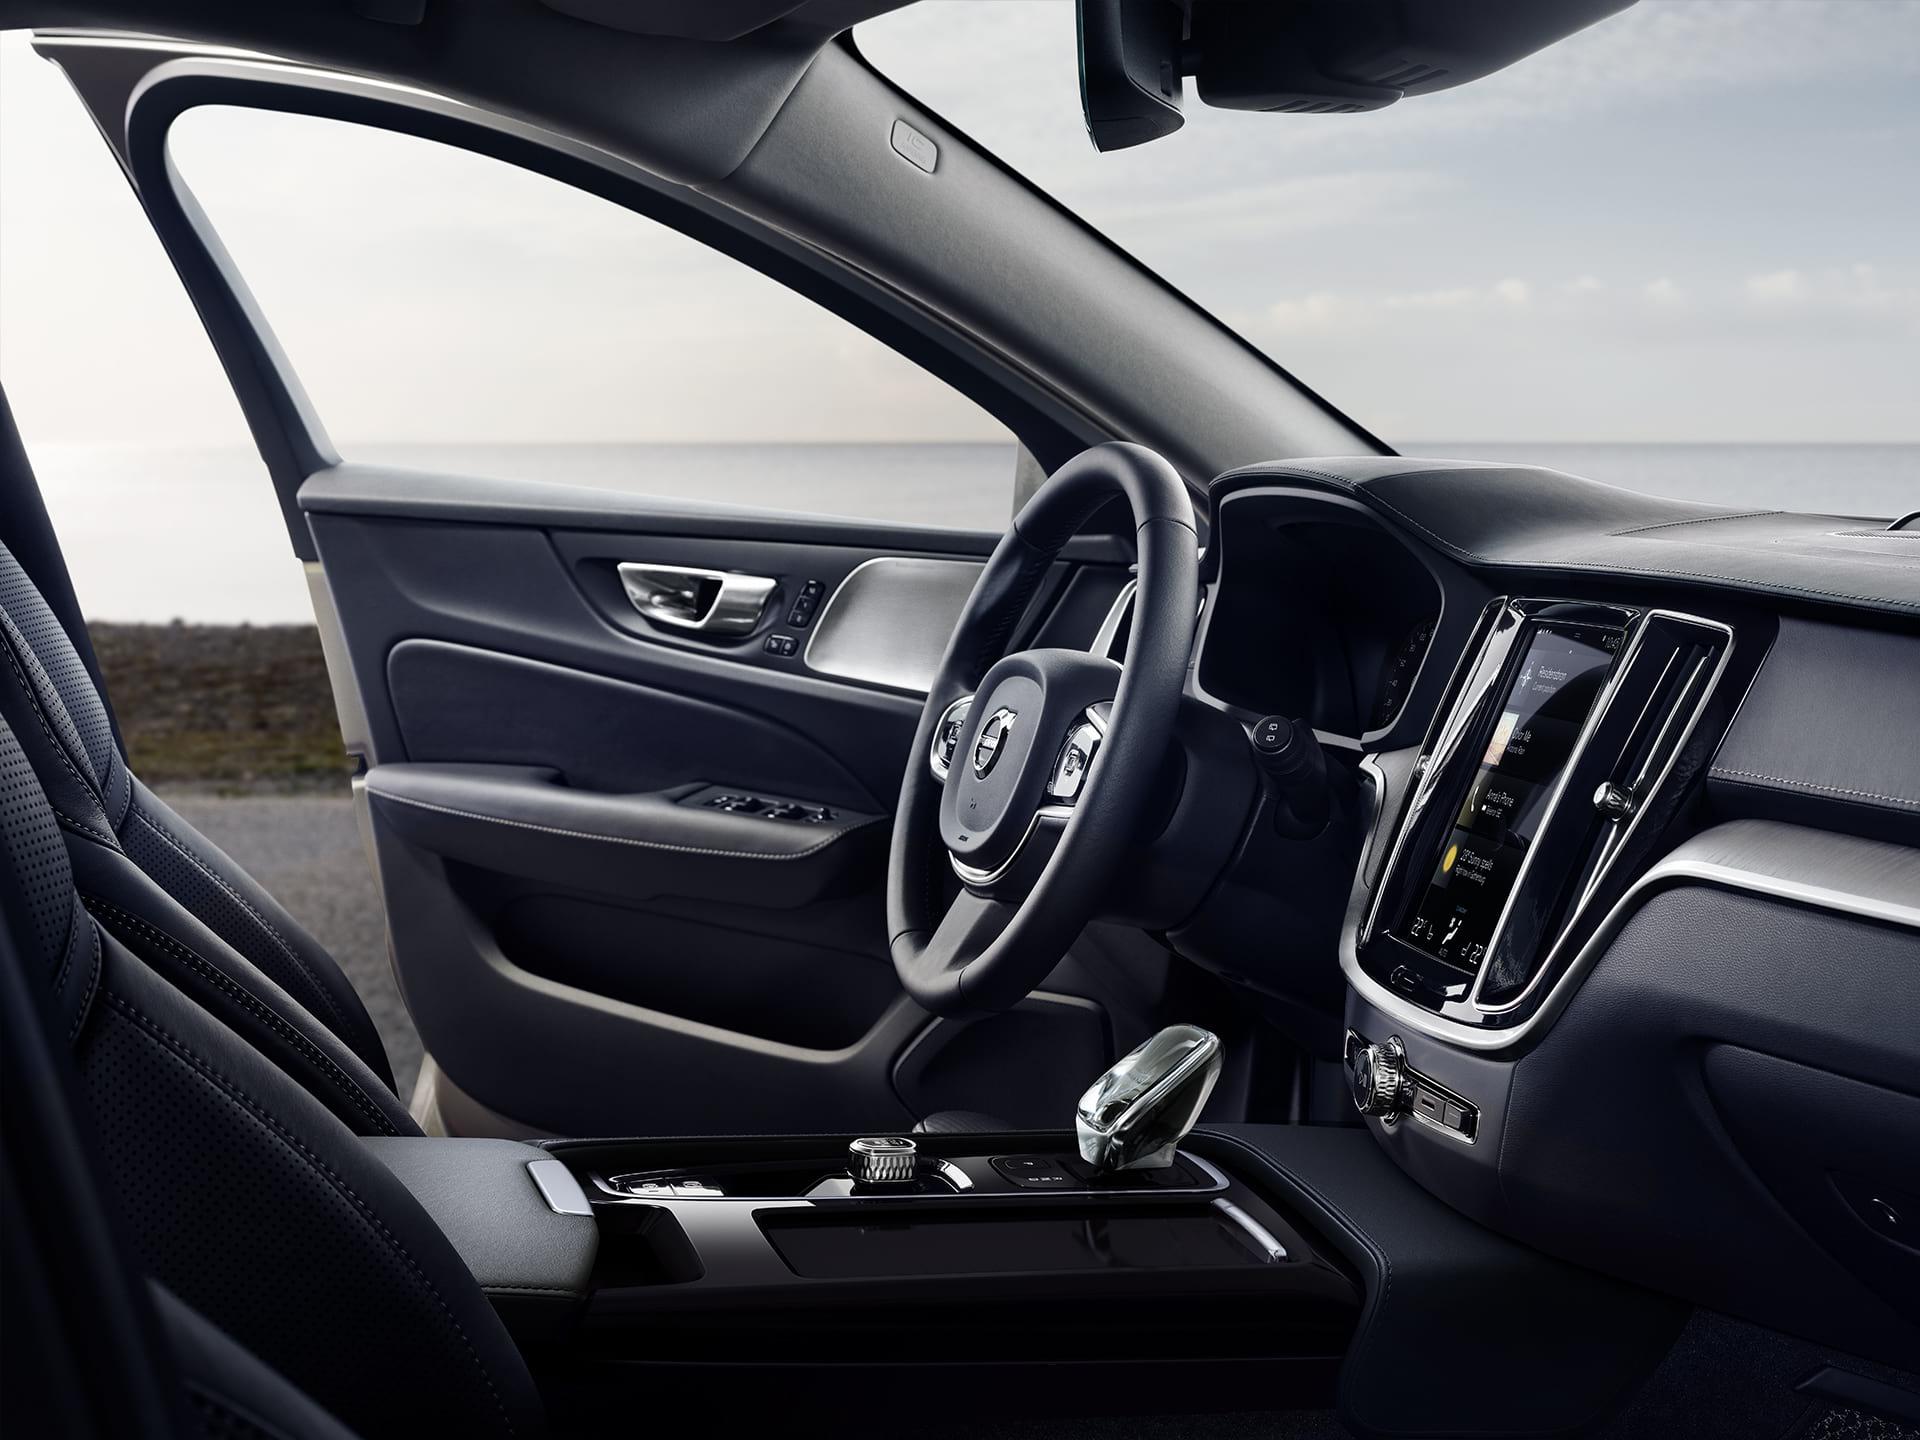 V60 前排内部,驾驶员车门打开。